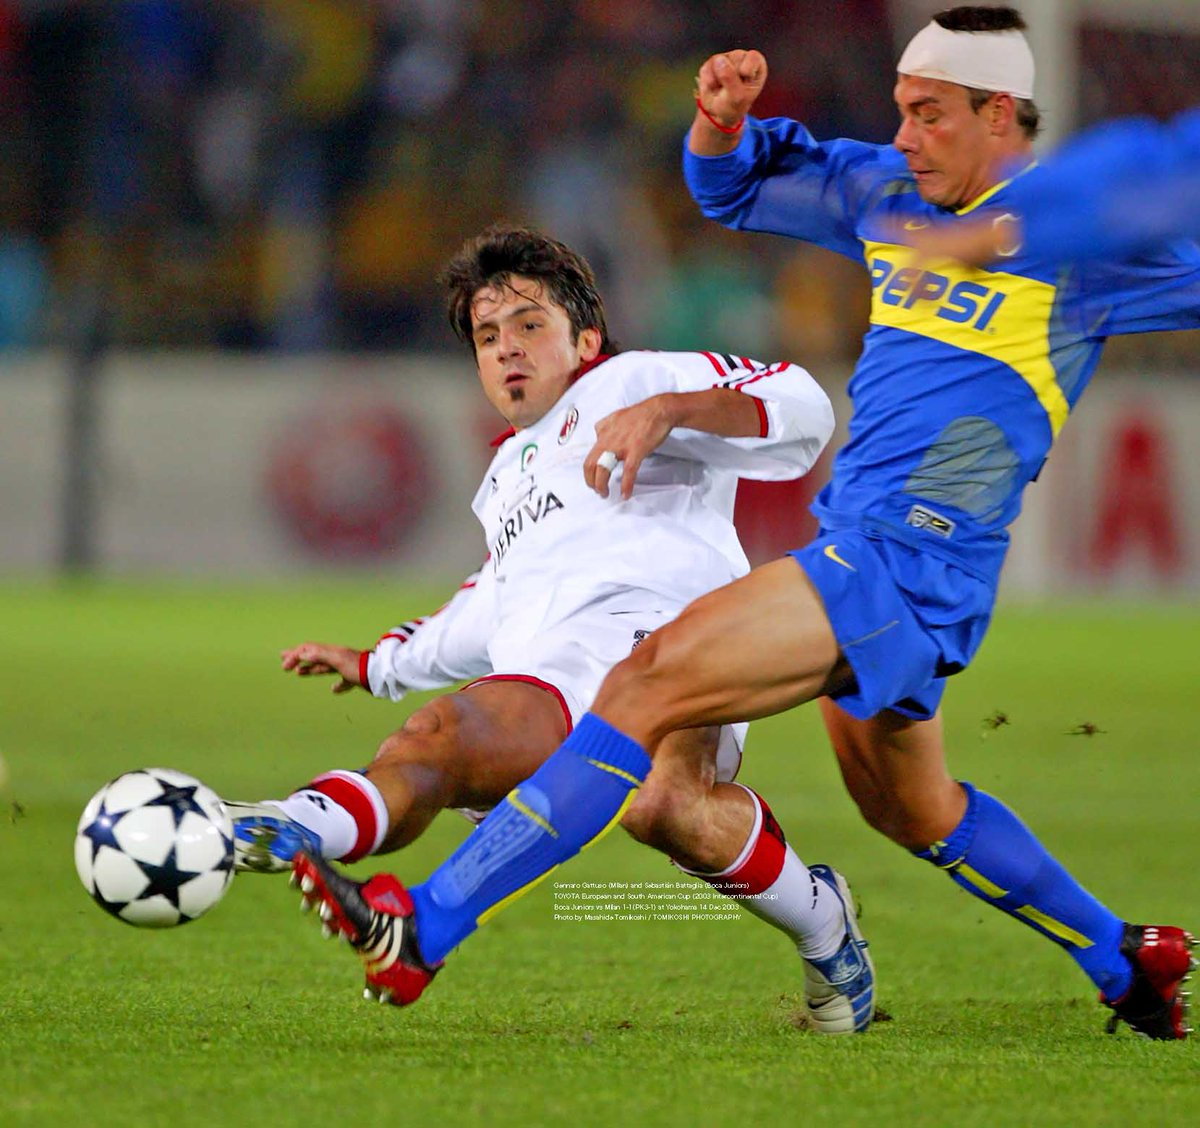 "tphoto on Twitter: ""Gennaro Gattuso (MIlan) and Sebastián Battaglia (Boca  Juniors) TOYOTA European and South American Cup (2003 Intercontinental Cup)  Boca Juniors vs Milan 1-1(PK3-1) at Yokohama 14 Dec 2003 Photo by"